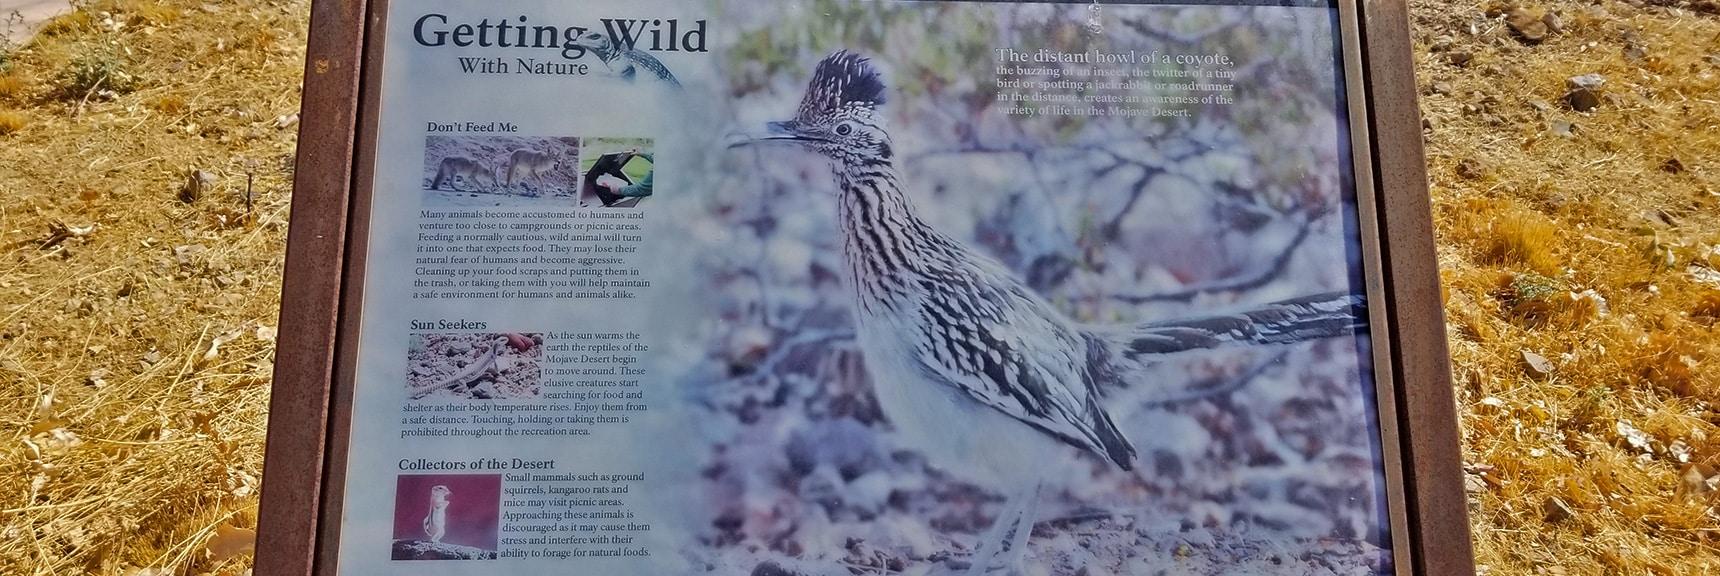 Interpretive Display of Wildlife Around the Callville Bay Area   Callville Summit Trail   Lake Mead National Recreation Area, Nevada